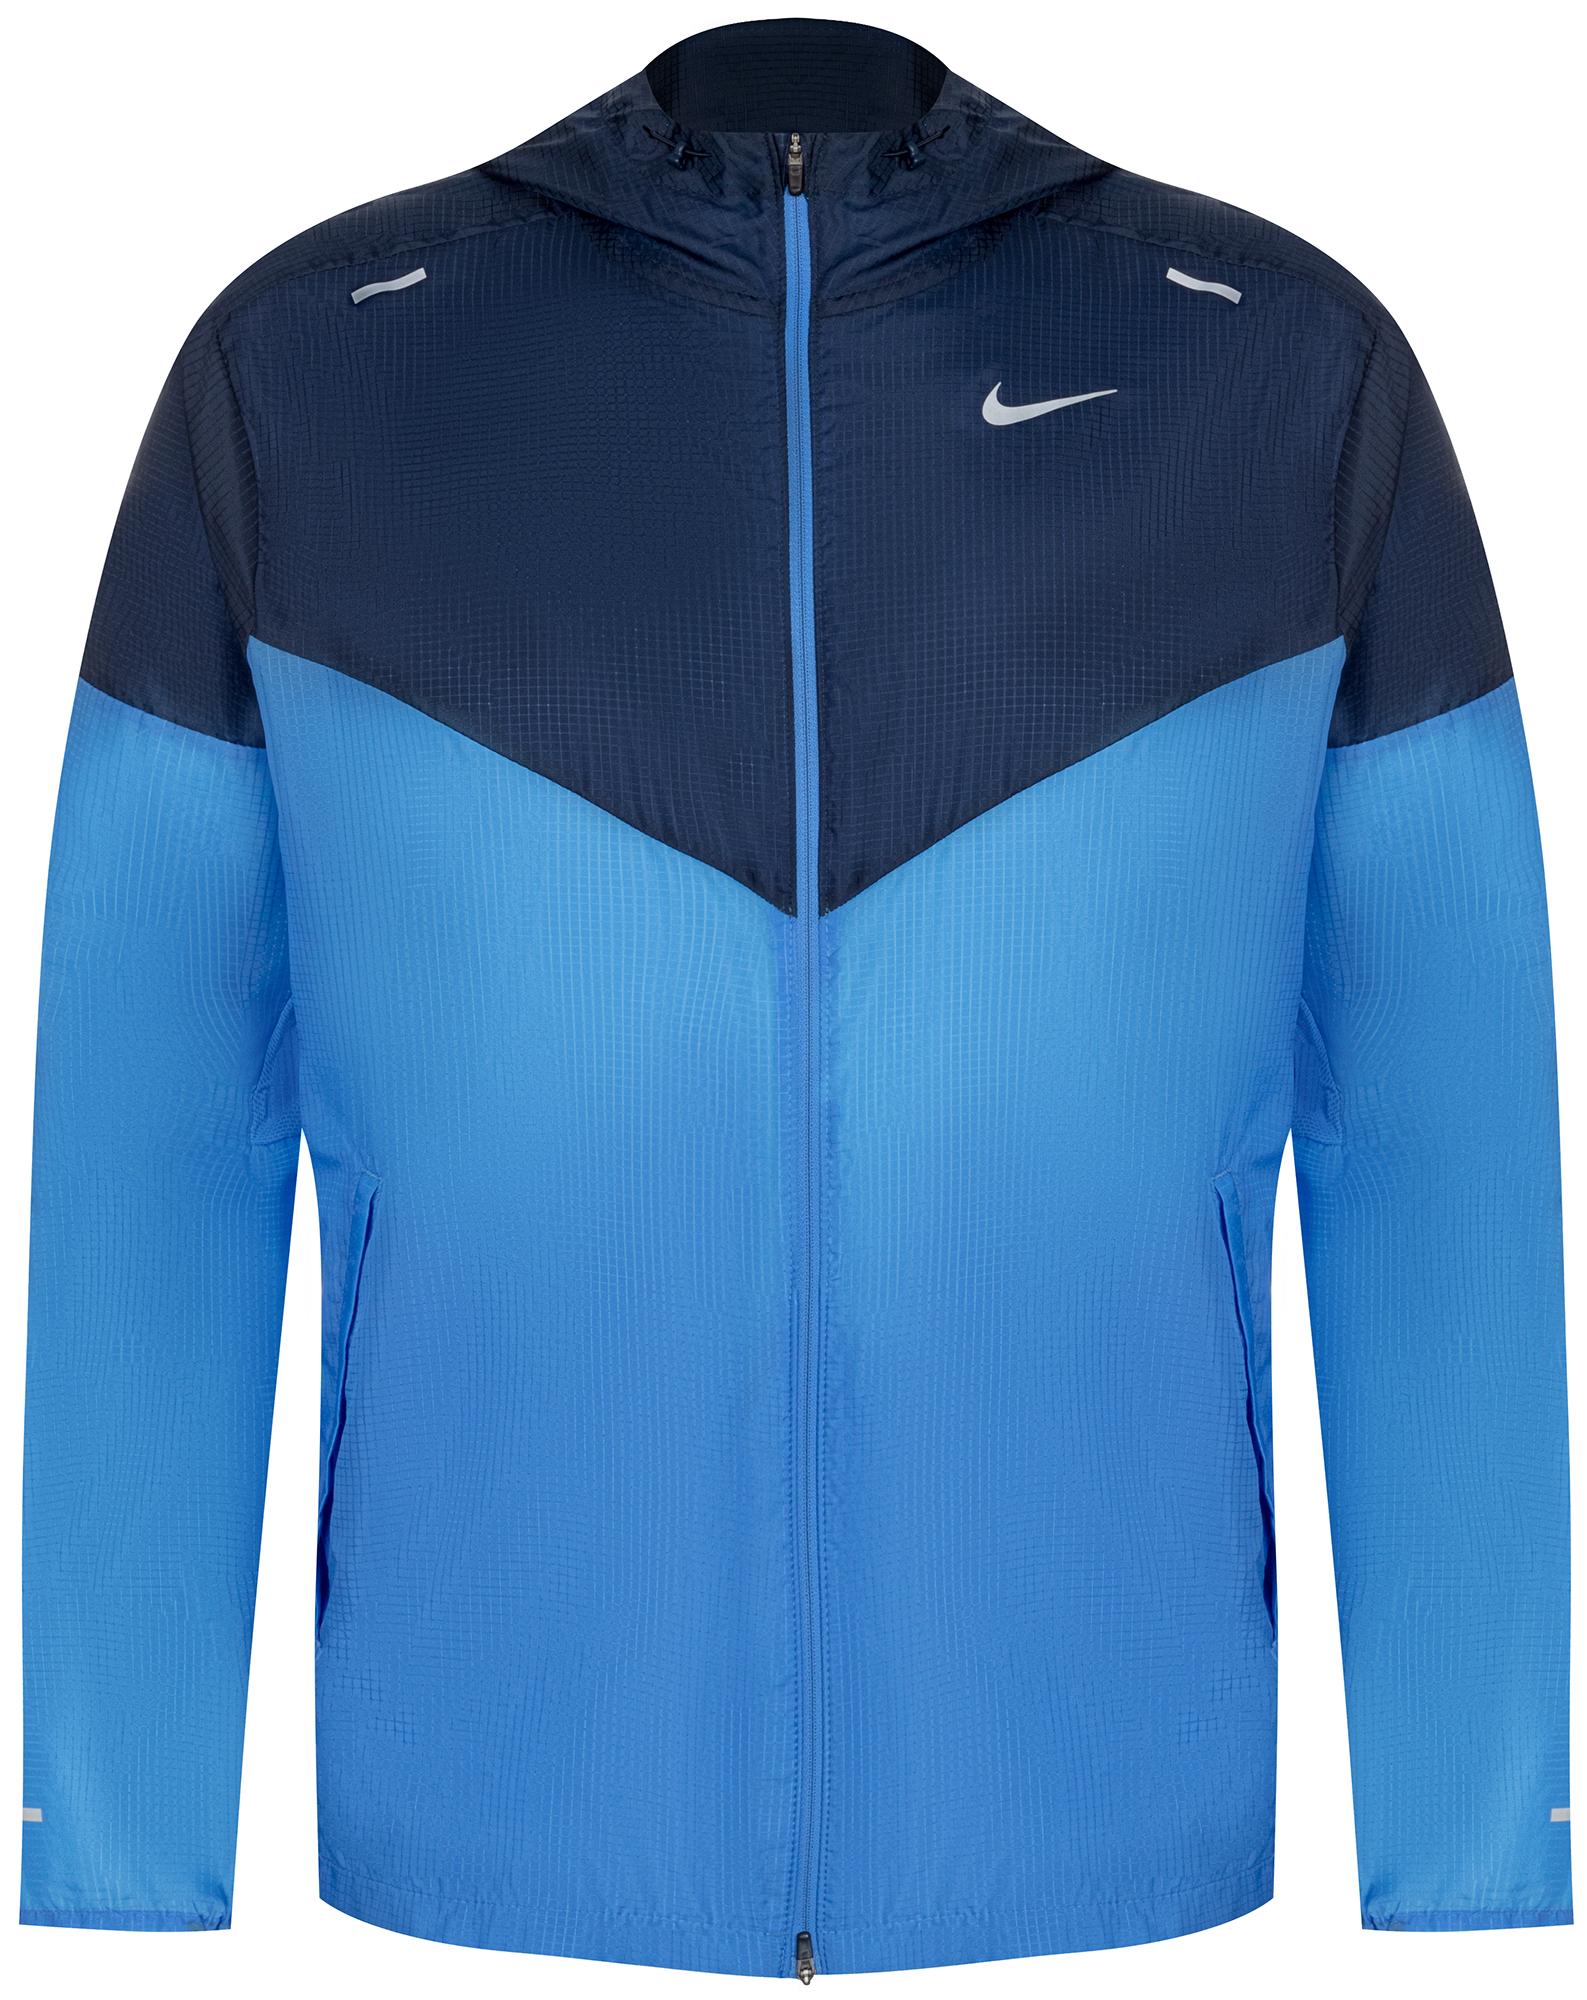 цена Nike Ветровка мужская Nike Windrunner, размер 46-48 онлайн в 2017 году